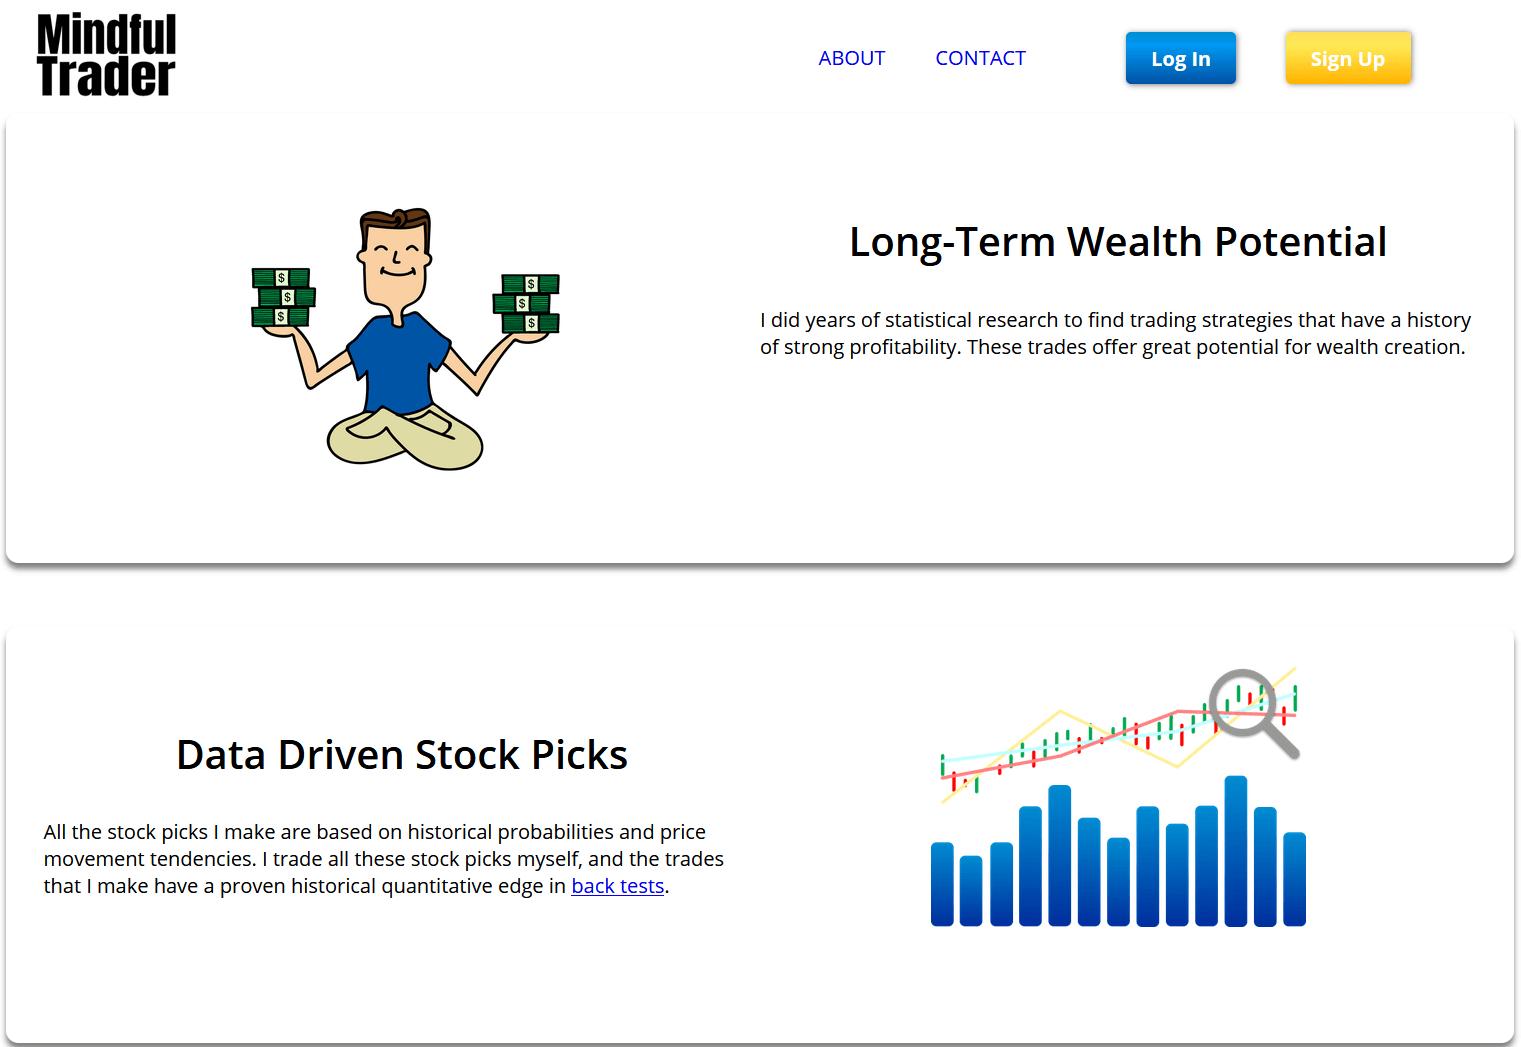 mindful trader stock picks